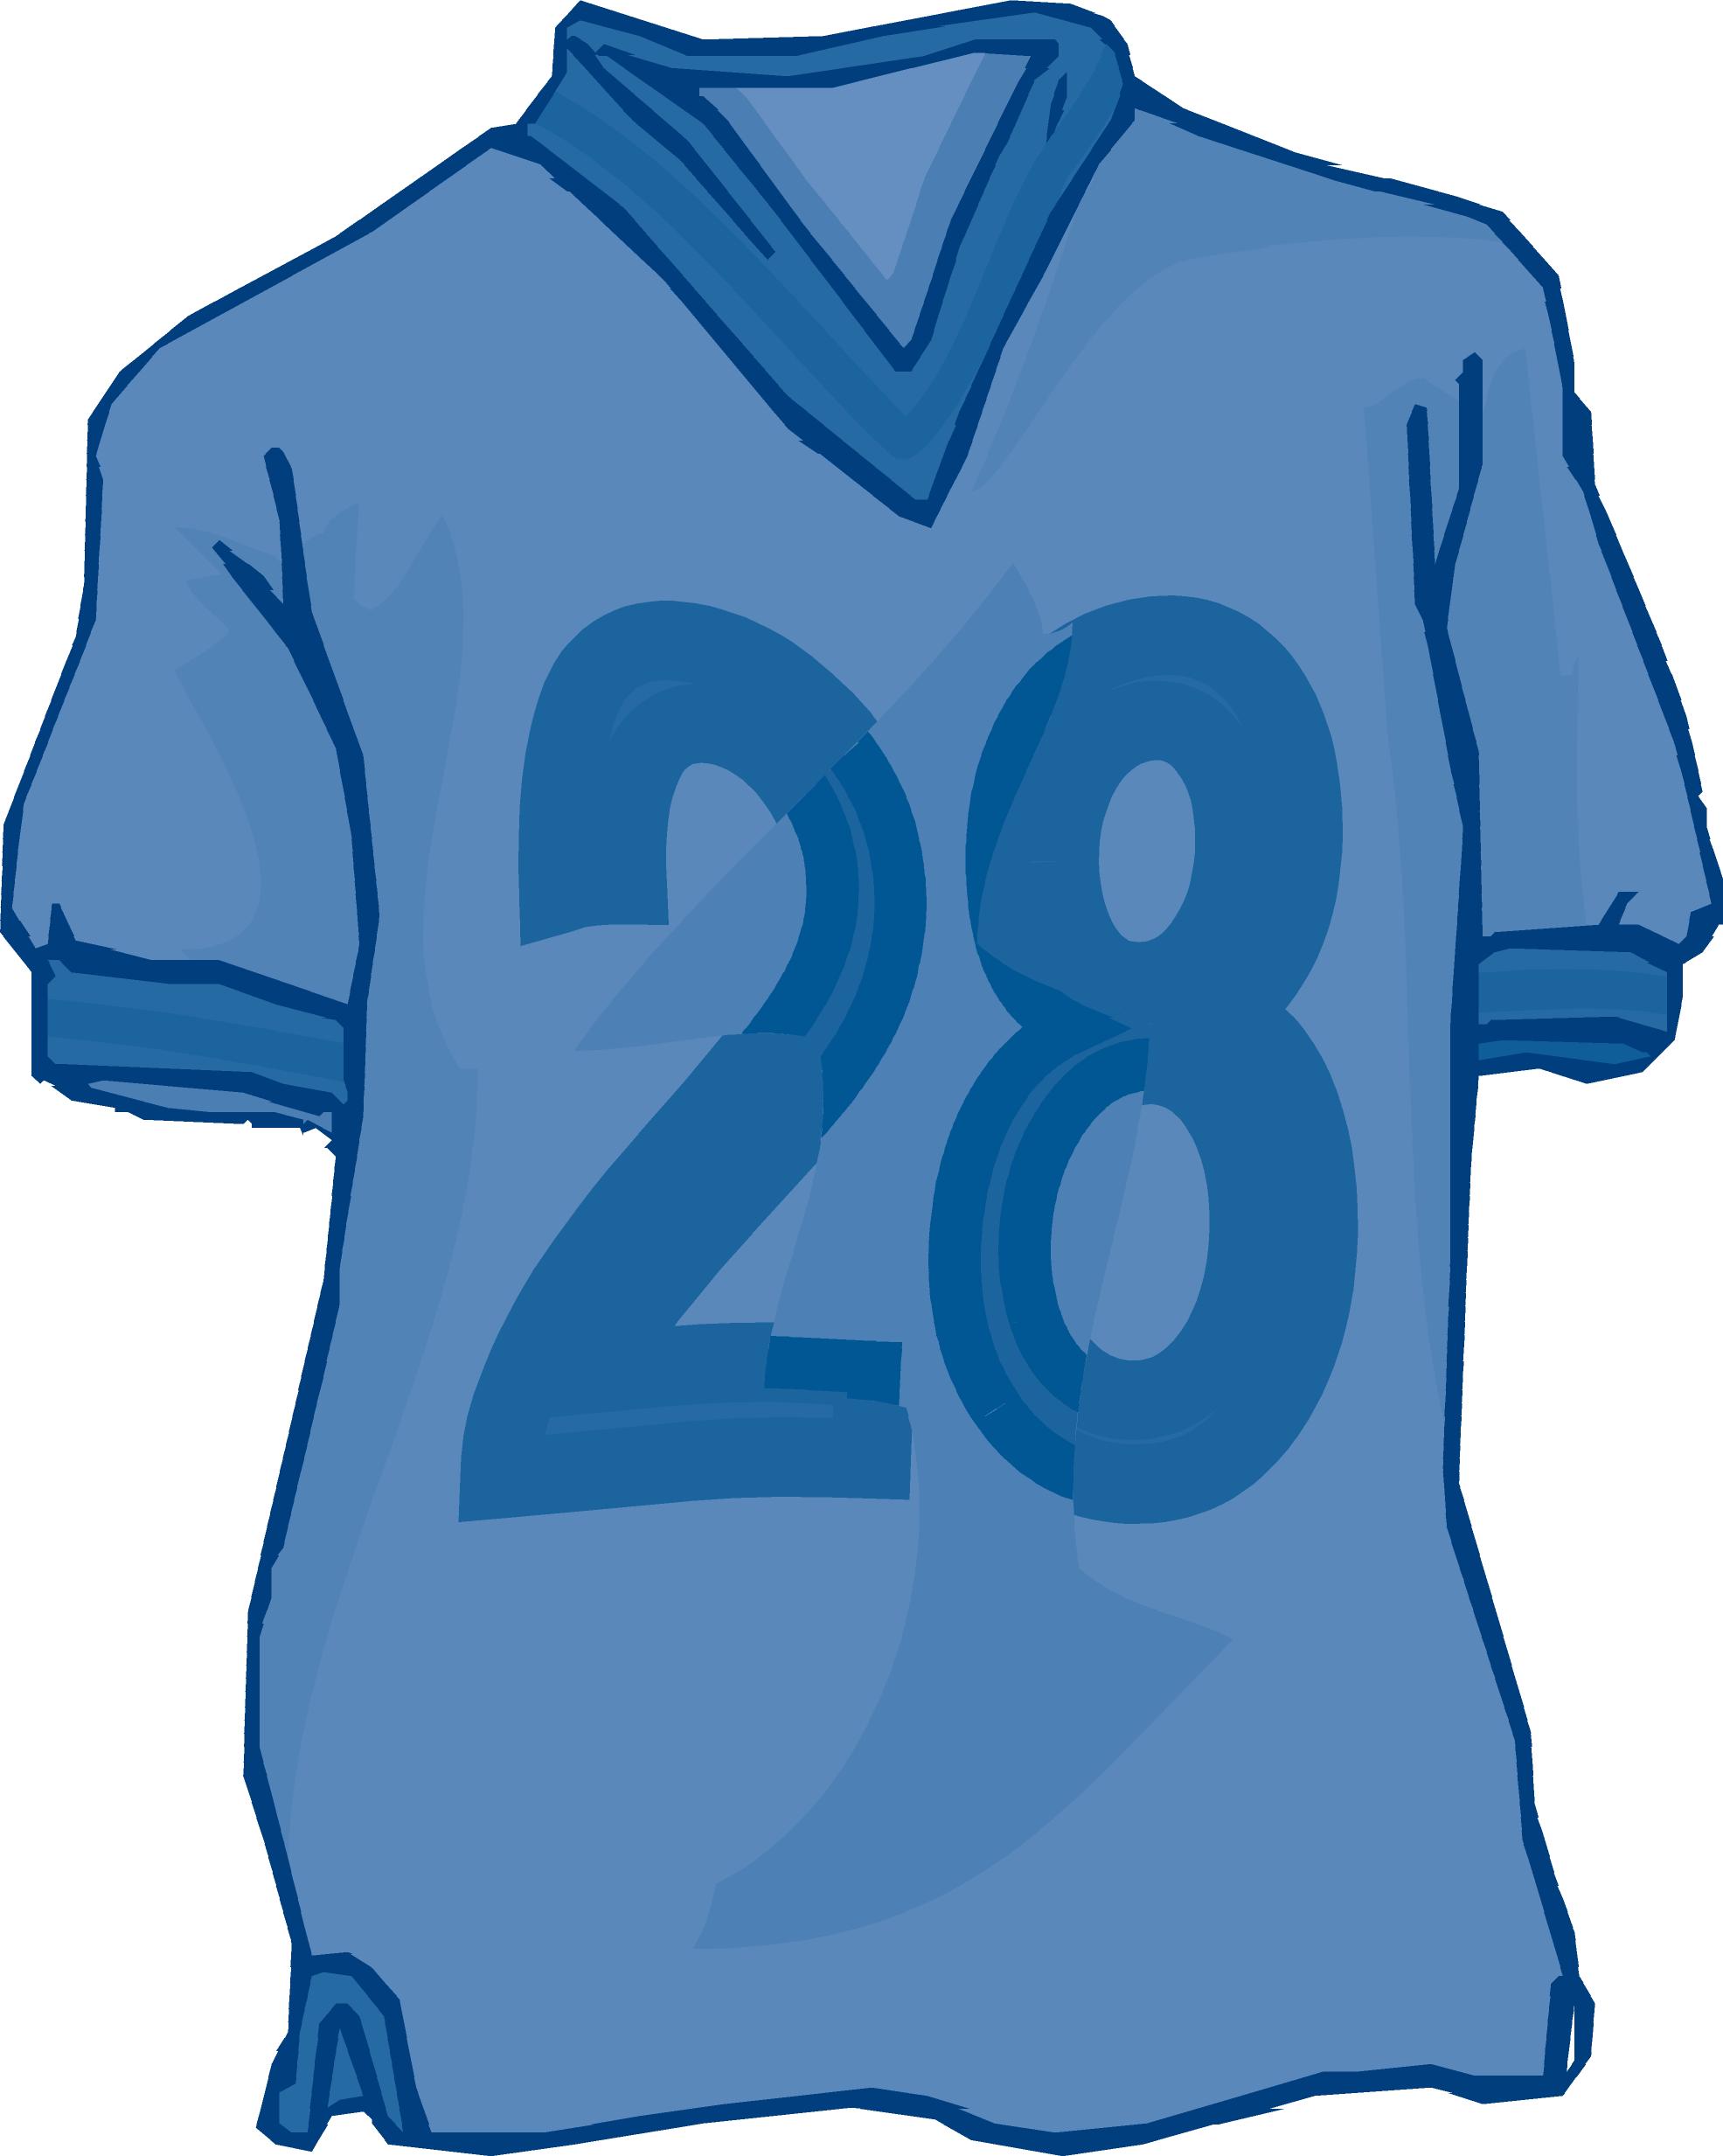 Football Jersey Clipart. Clothes Closet Clipart .